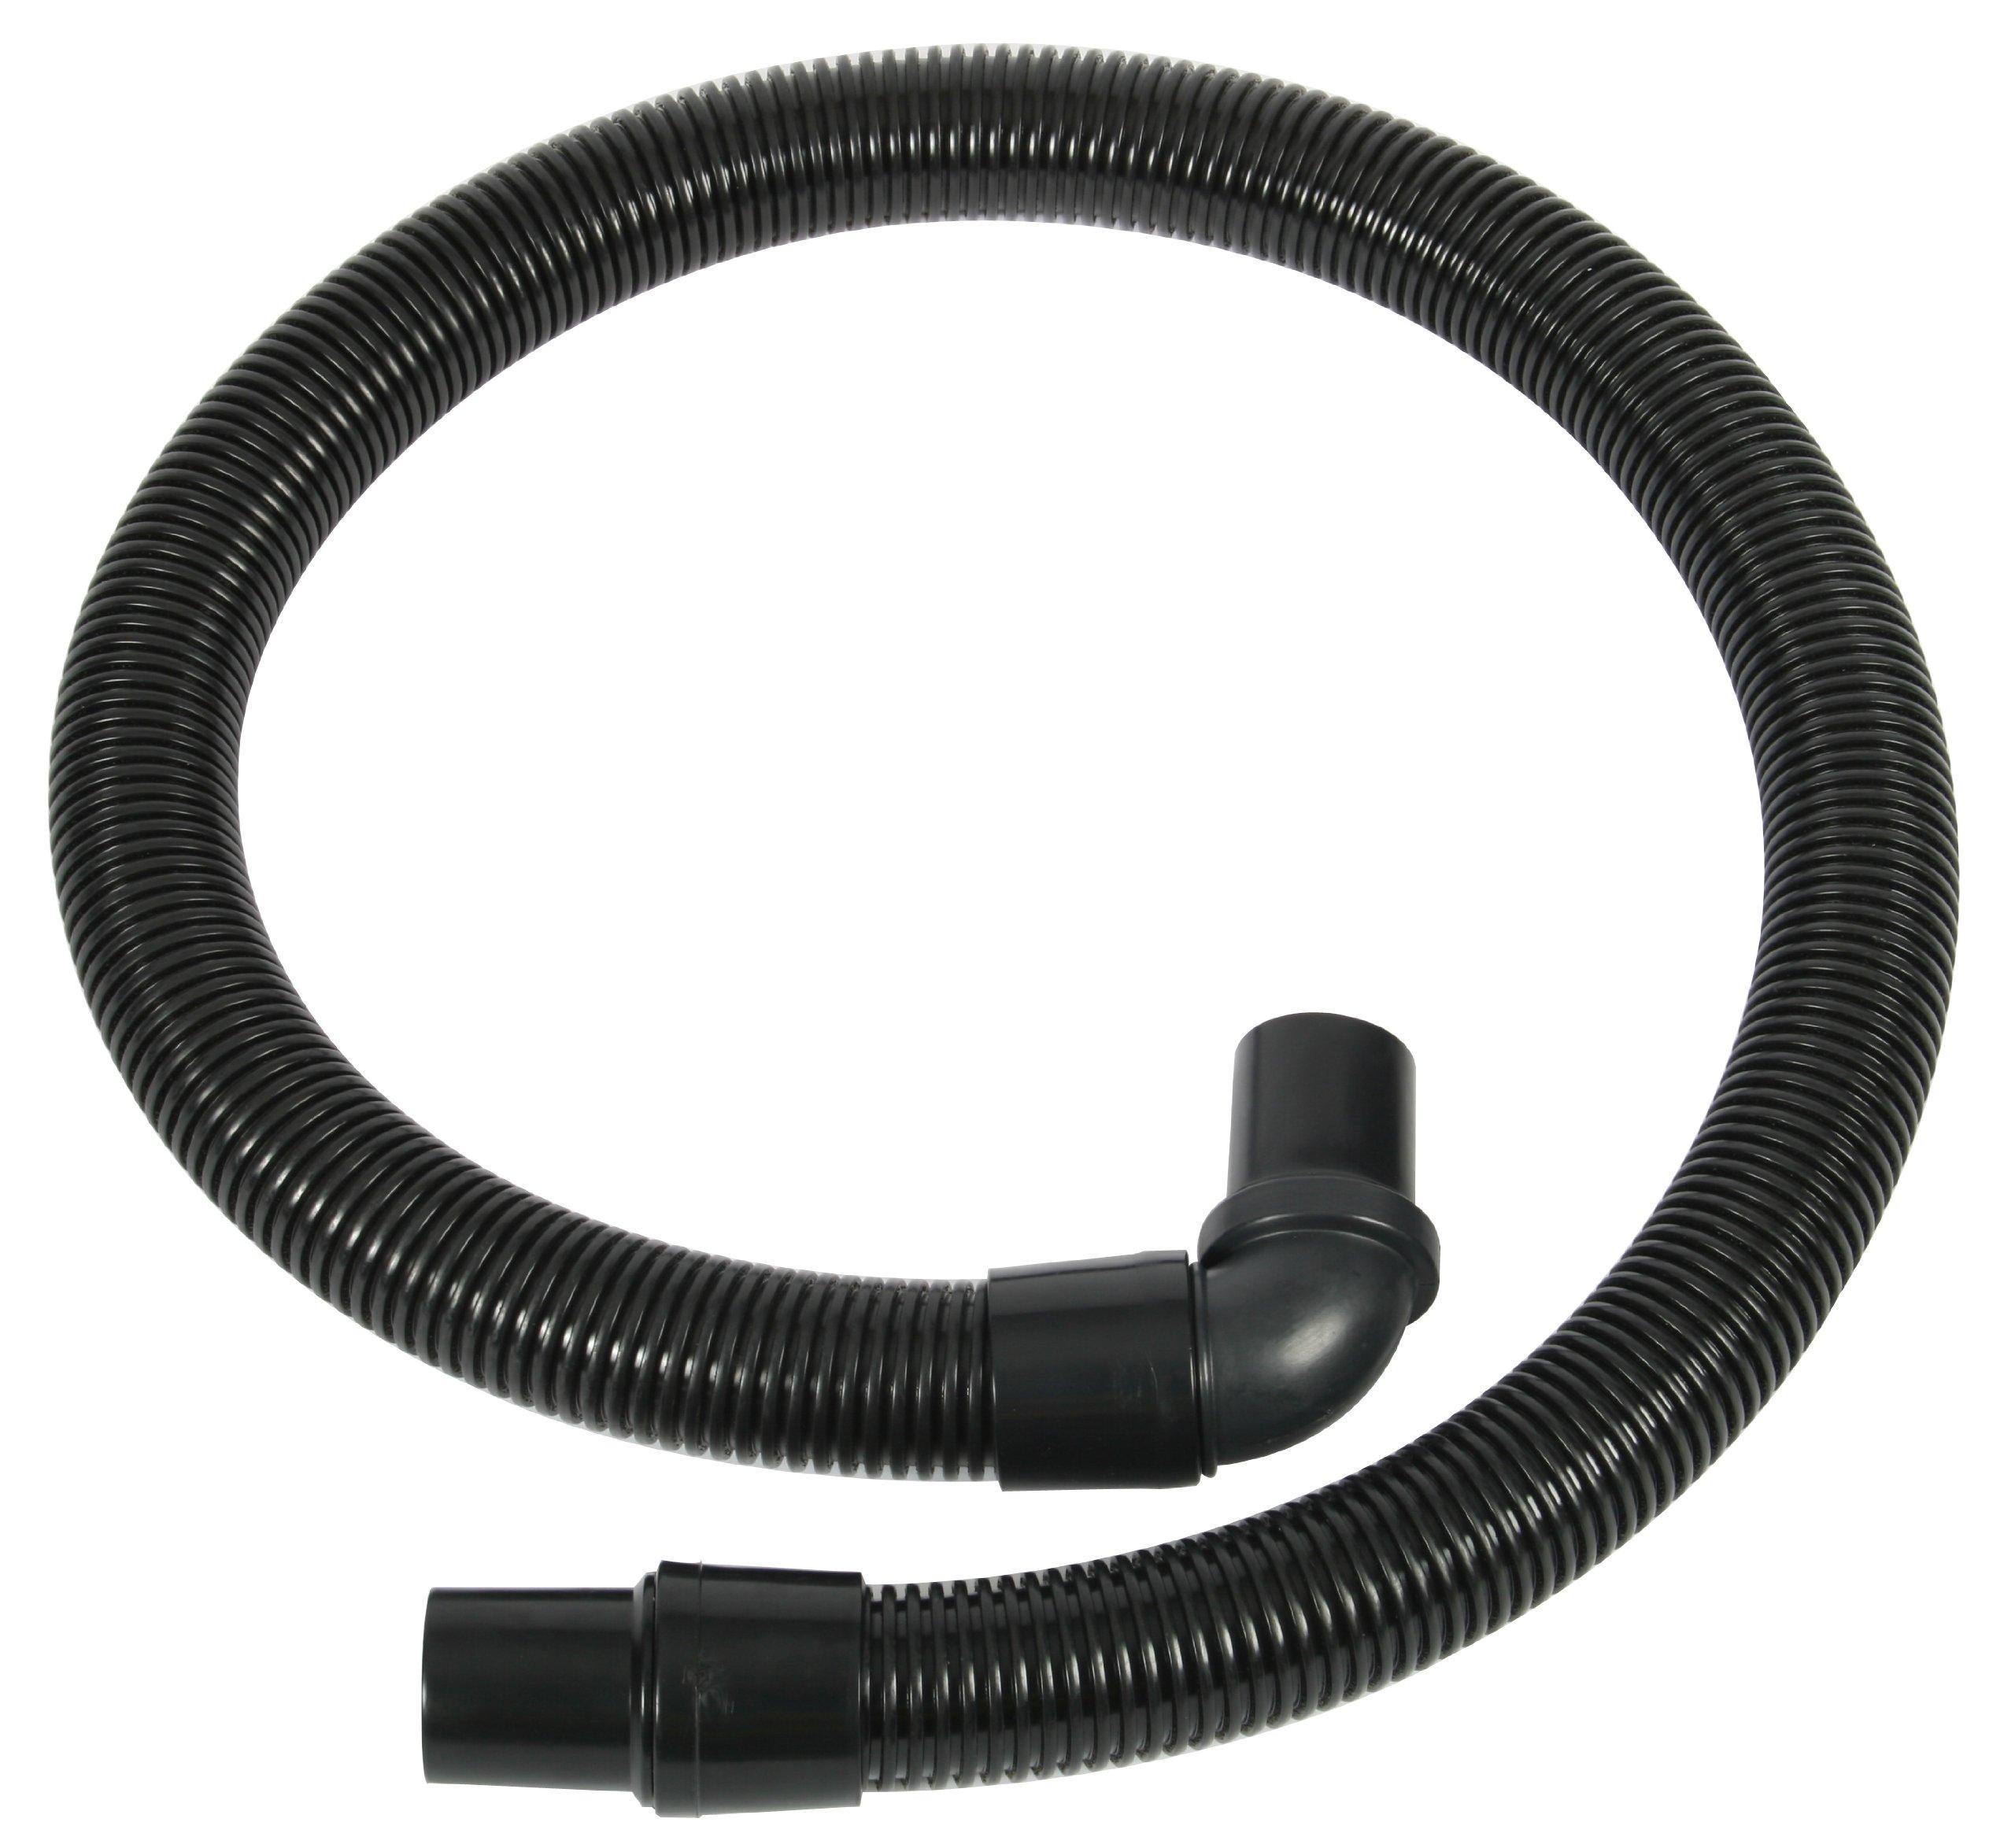 Cen-Tec Systems 90144 Commercial Vacuum Hose, 4-Feet